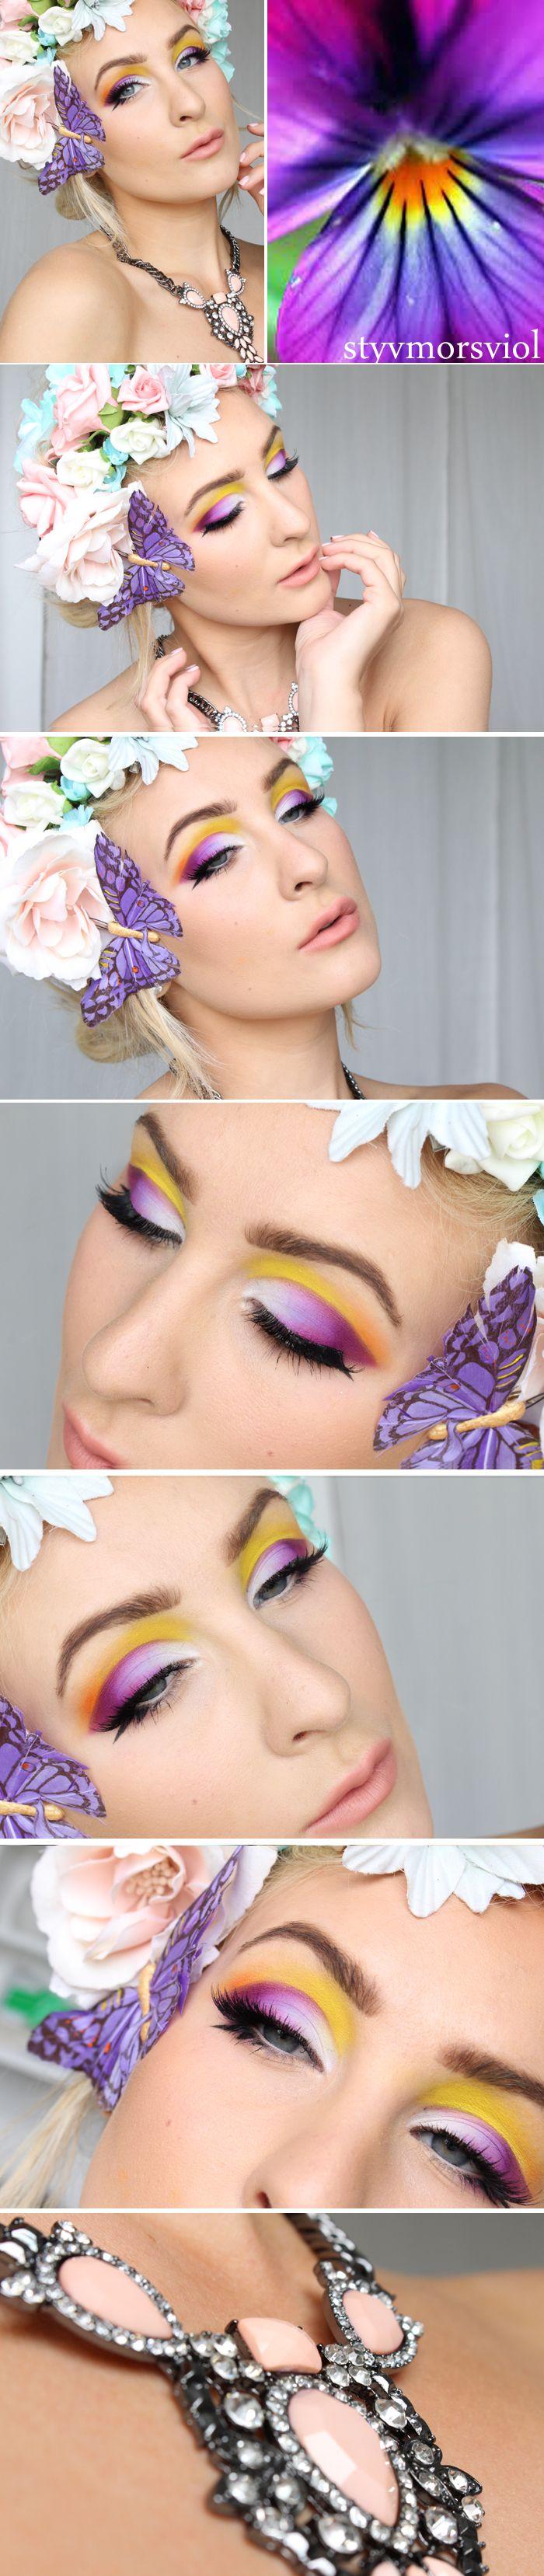 Dagens makeup – Styvmorsviol |